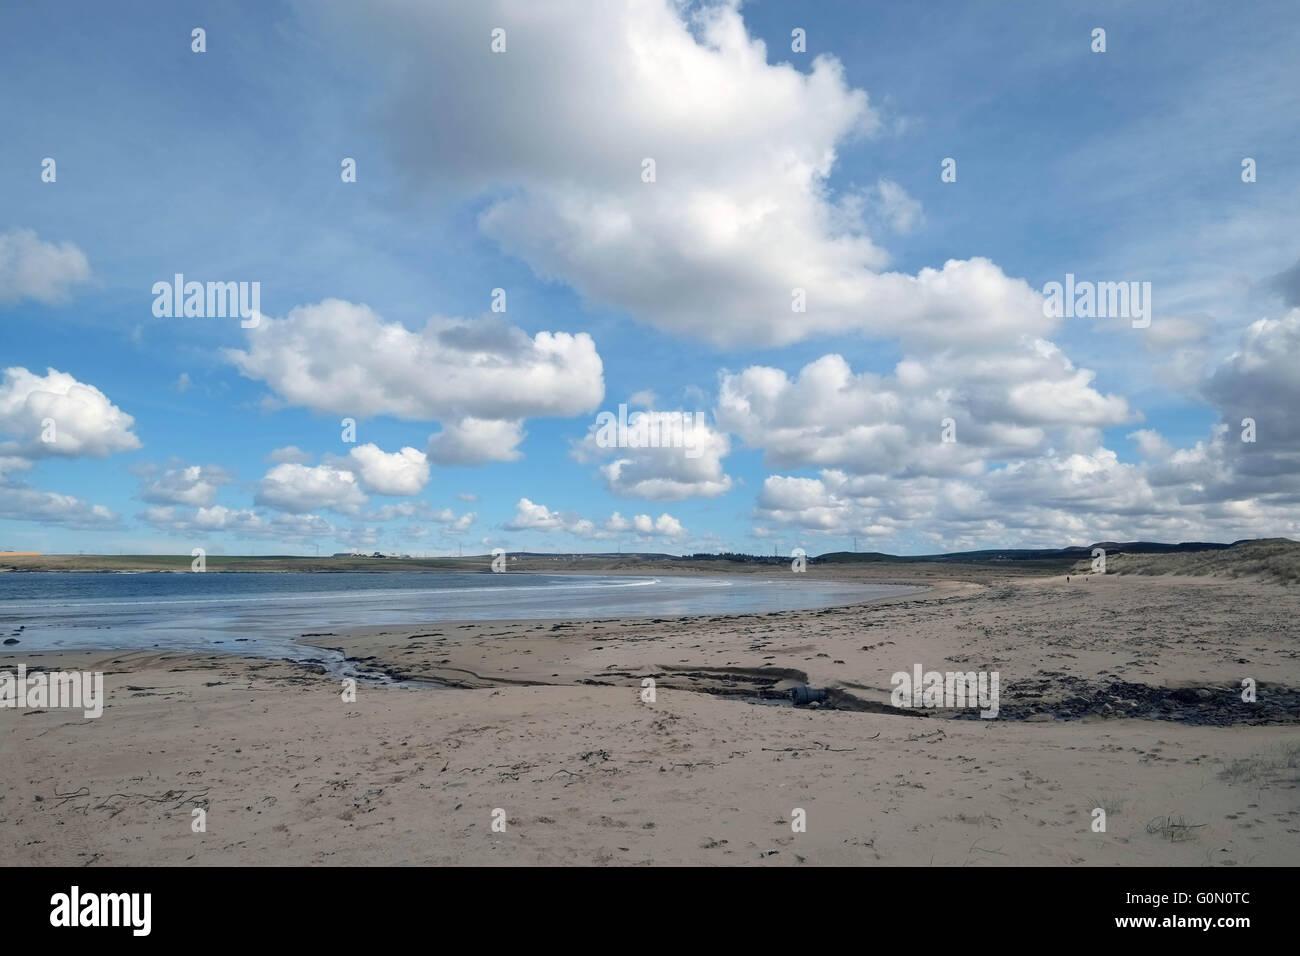 20/04/2016,  Sandside beach, Reay, Caithness, UK - Stock Image